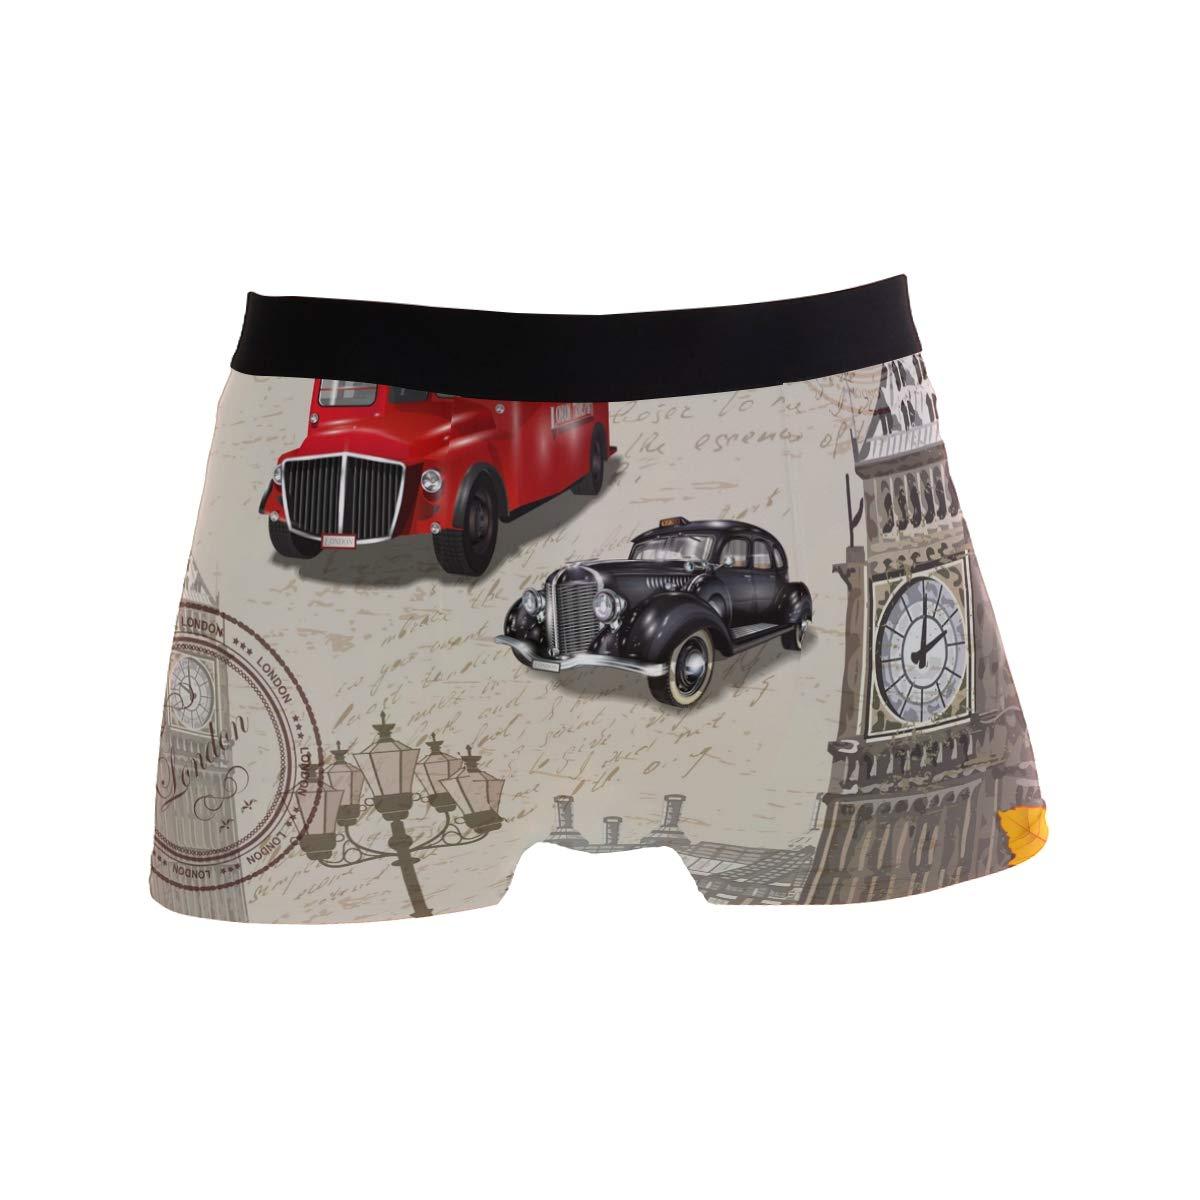 MOFEIYUE Mens Boxer Briefs Vintage London Maple Butterfly Soft Short Underpants Underwear for Men Boys